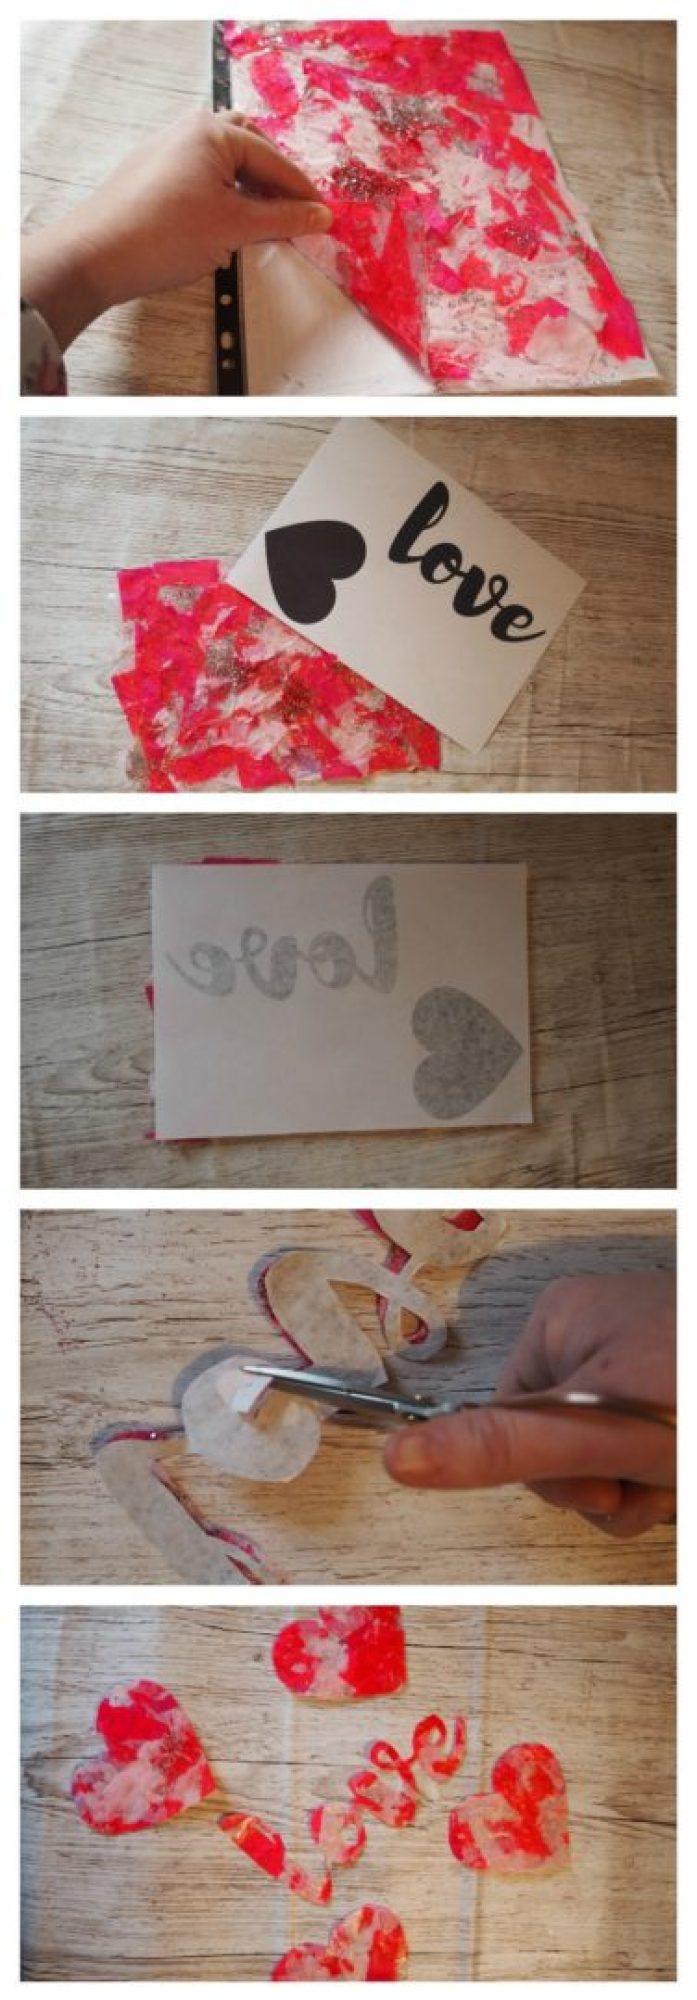 How to make heart suncatchers - valentines for kids